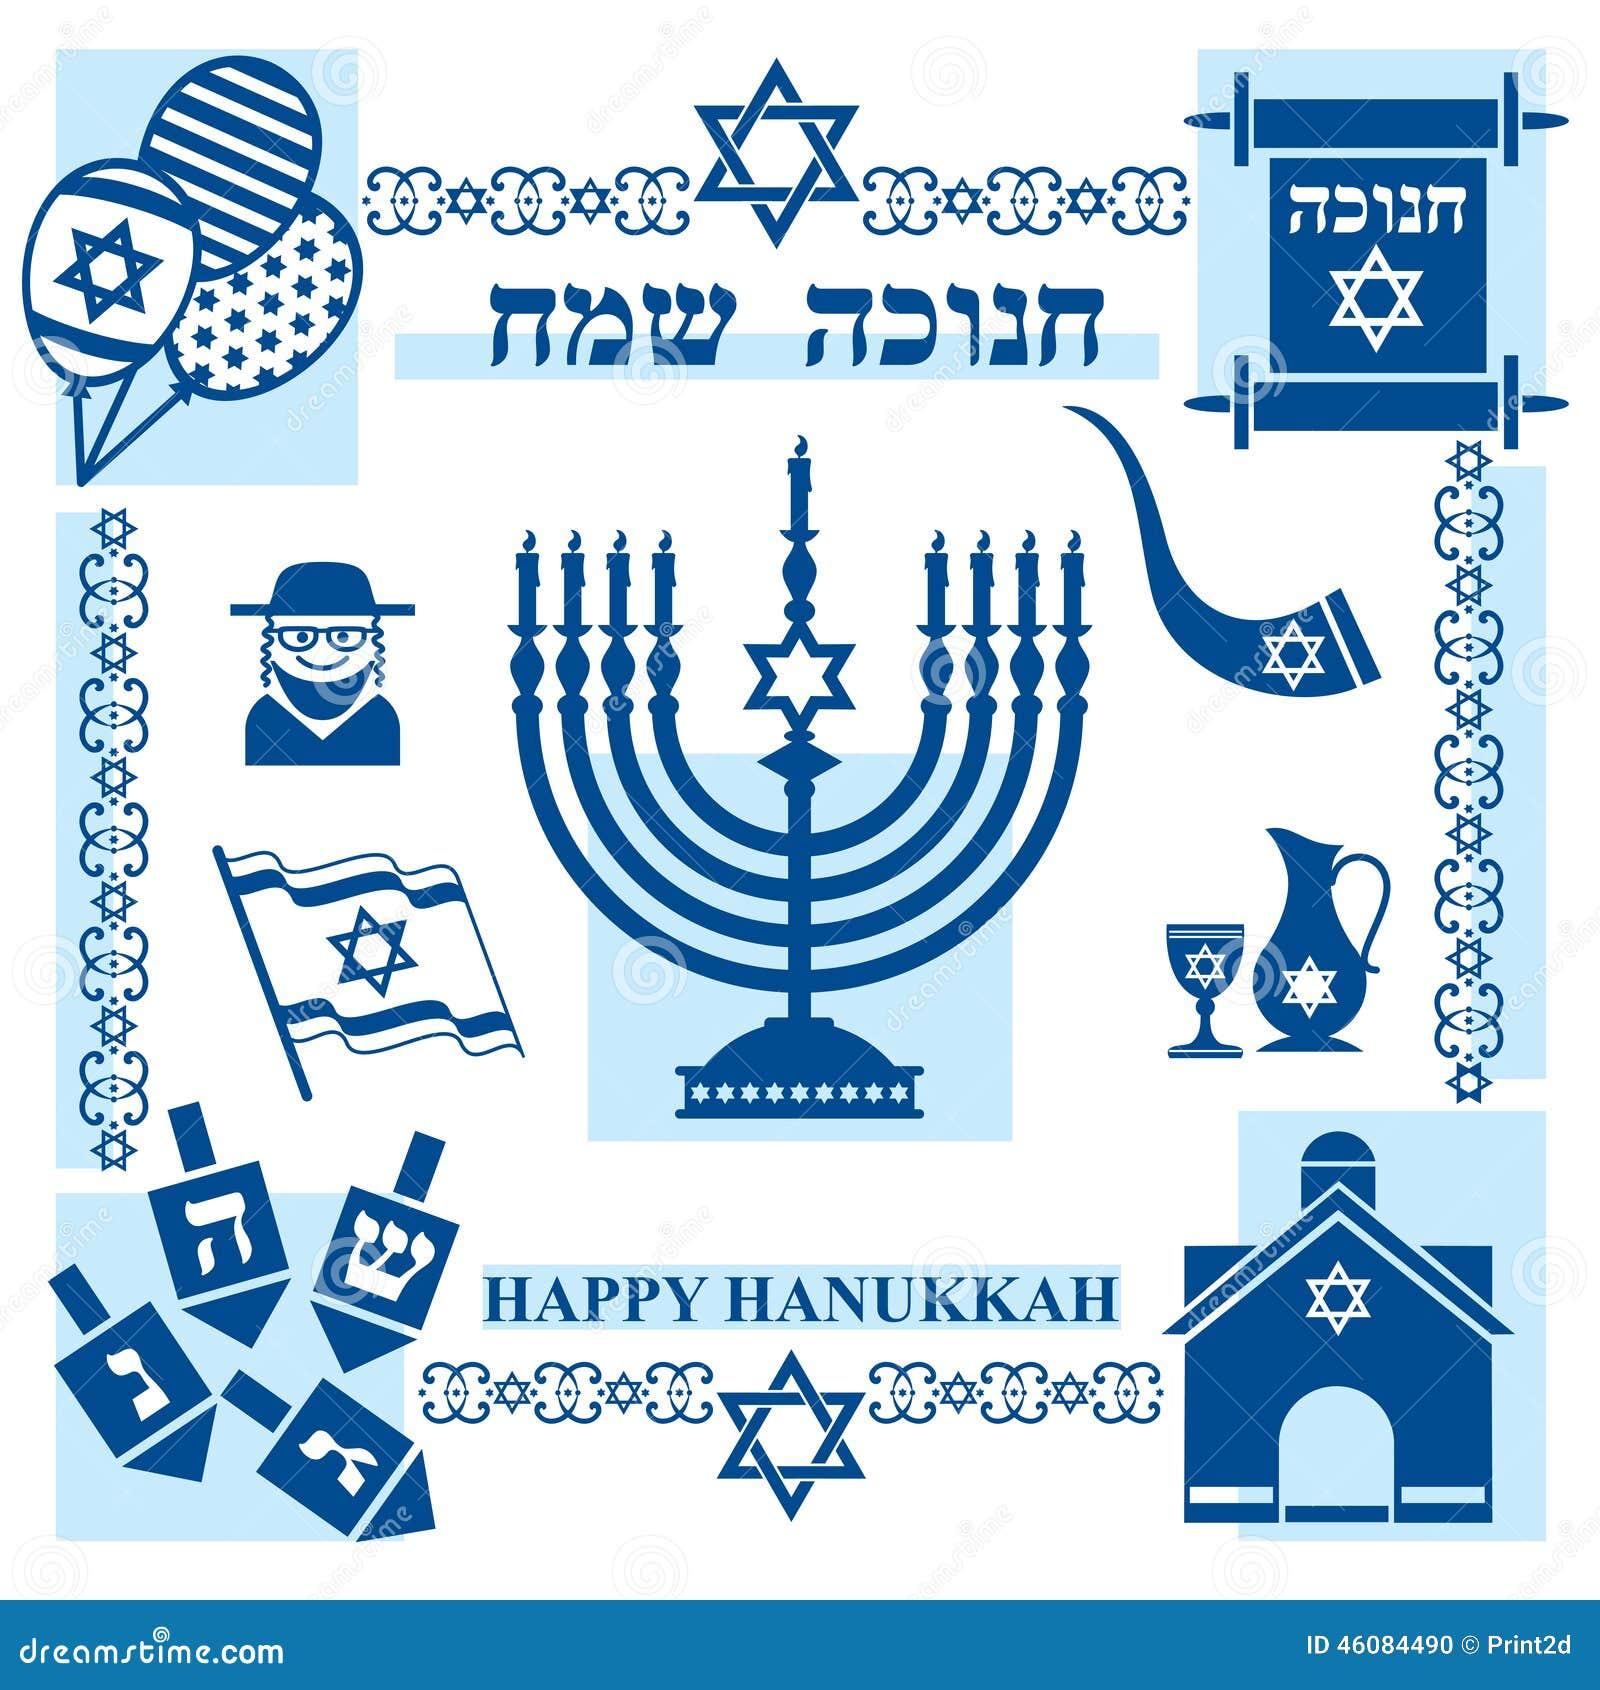 Hanukkah Symbols Stock Vector Illustration Of Candle 46084490